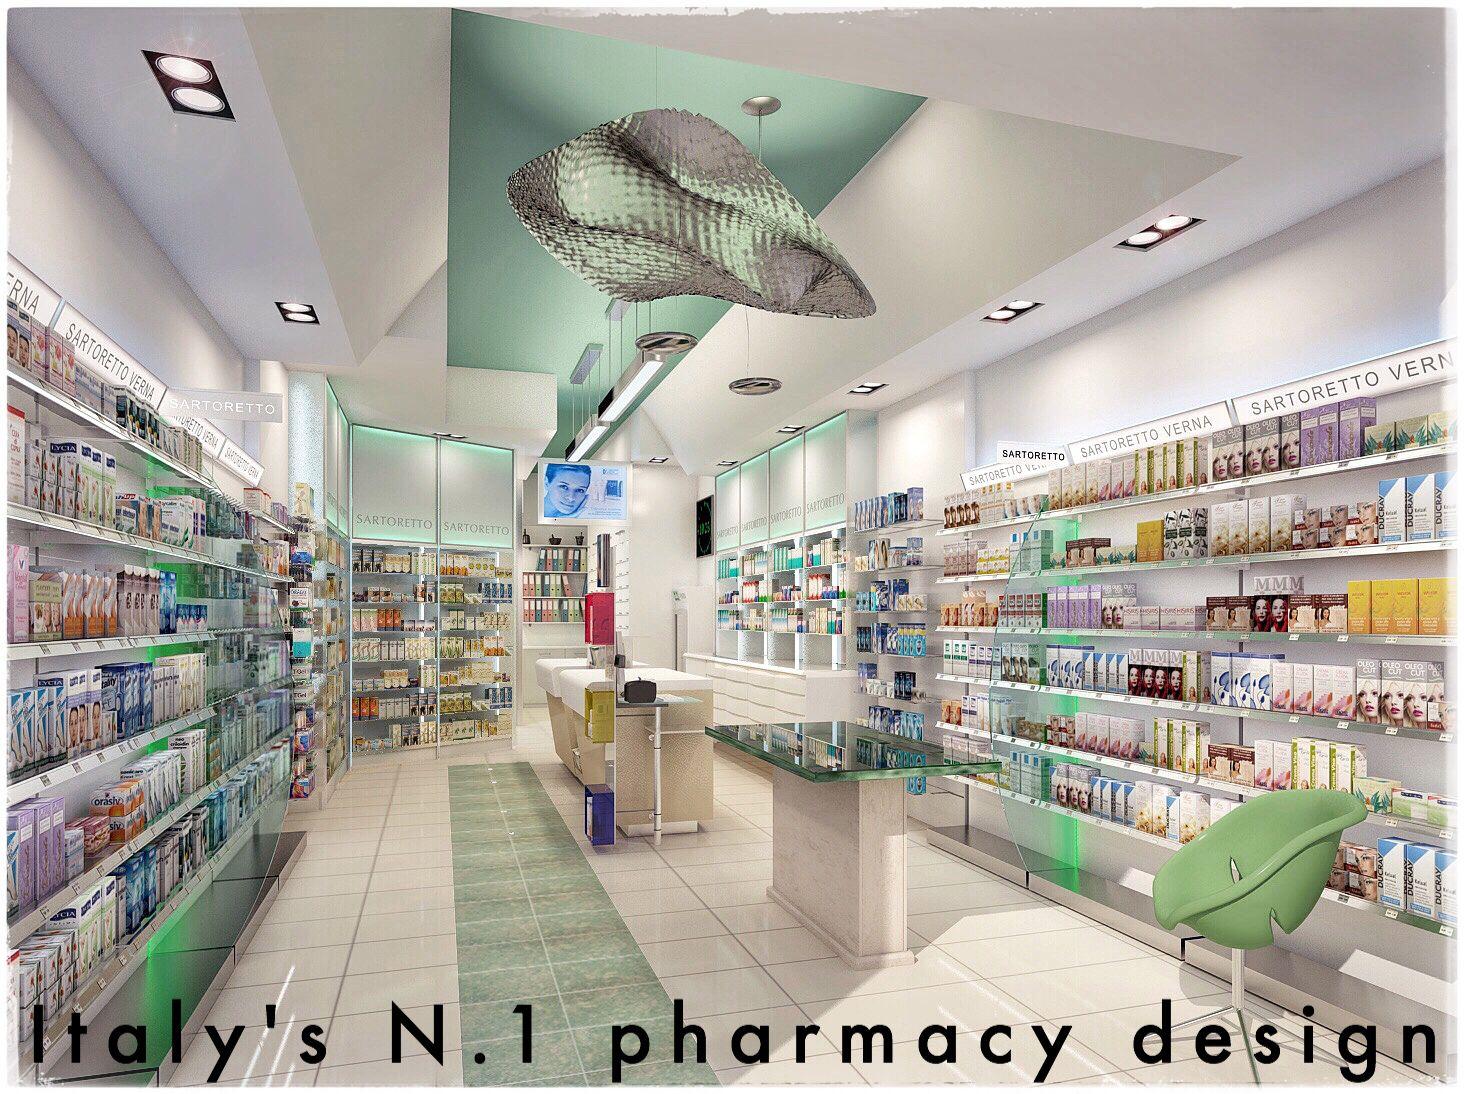 Awesome Italyu0027s N.1 Pharmacy Design Http://patriciaalberca.blogspot.com.